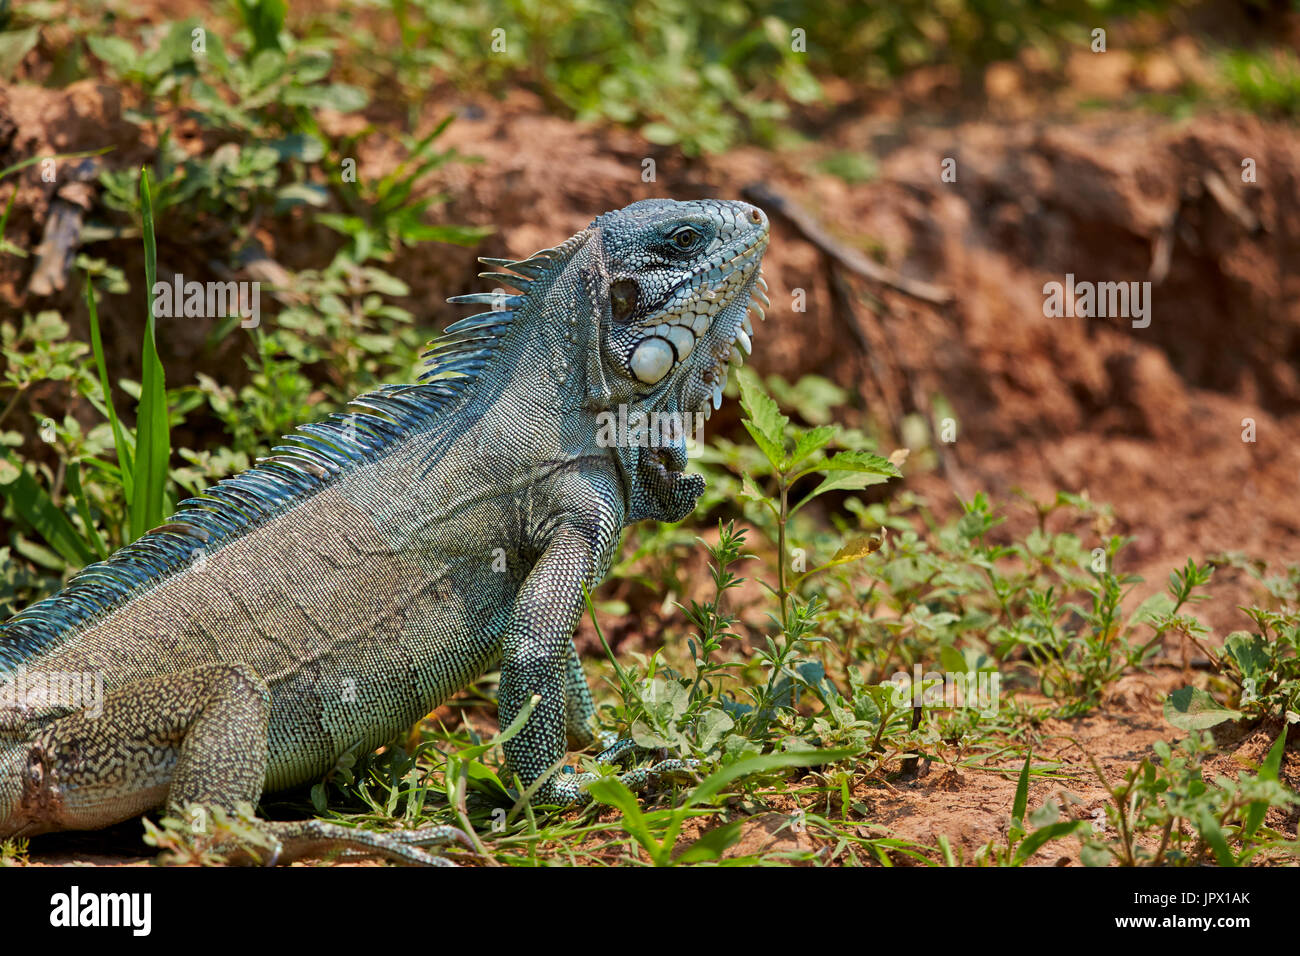 Green Iguana on the bank - Brazil Pantanal - Stock Image